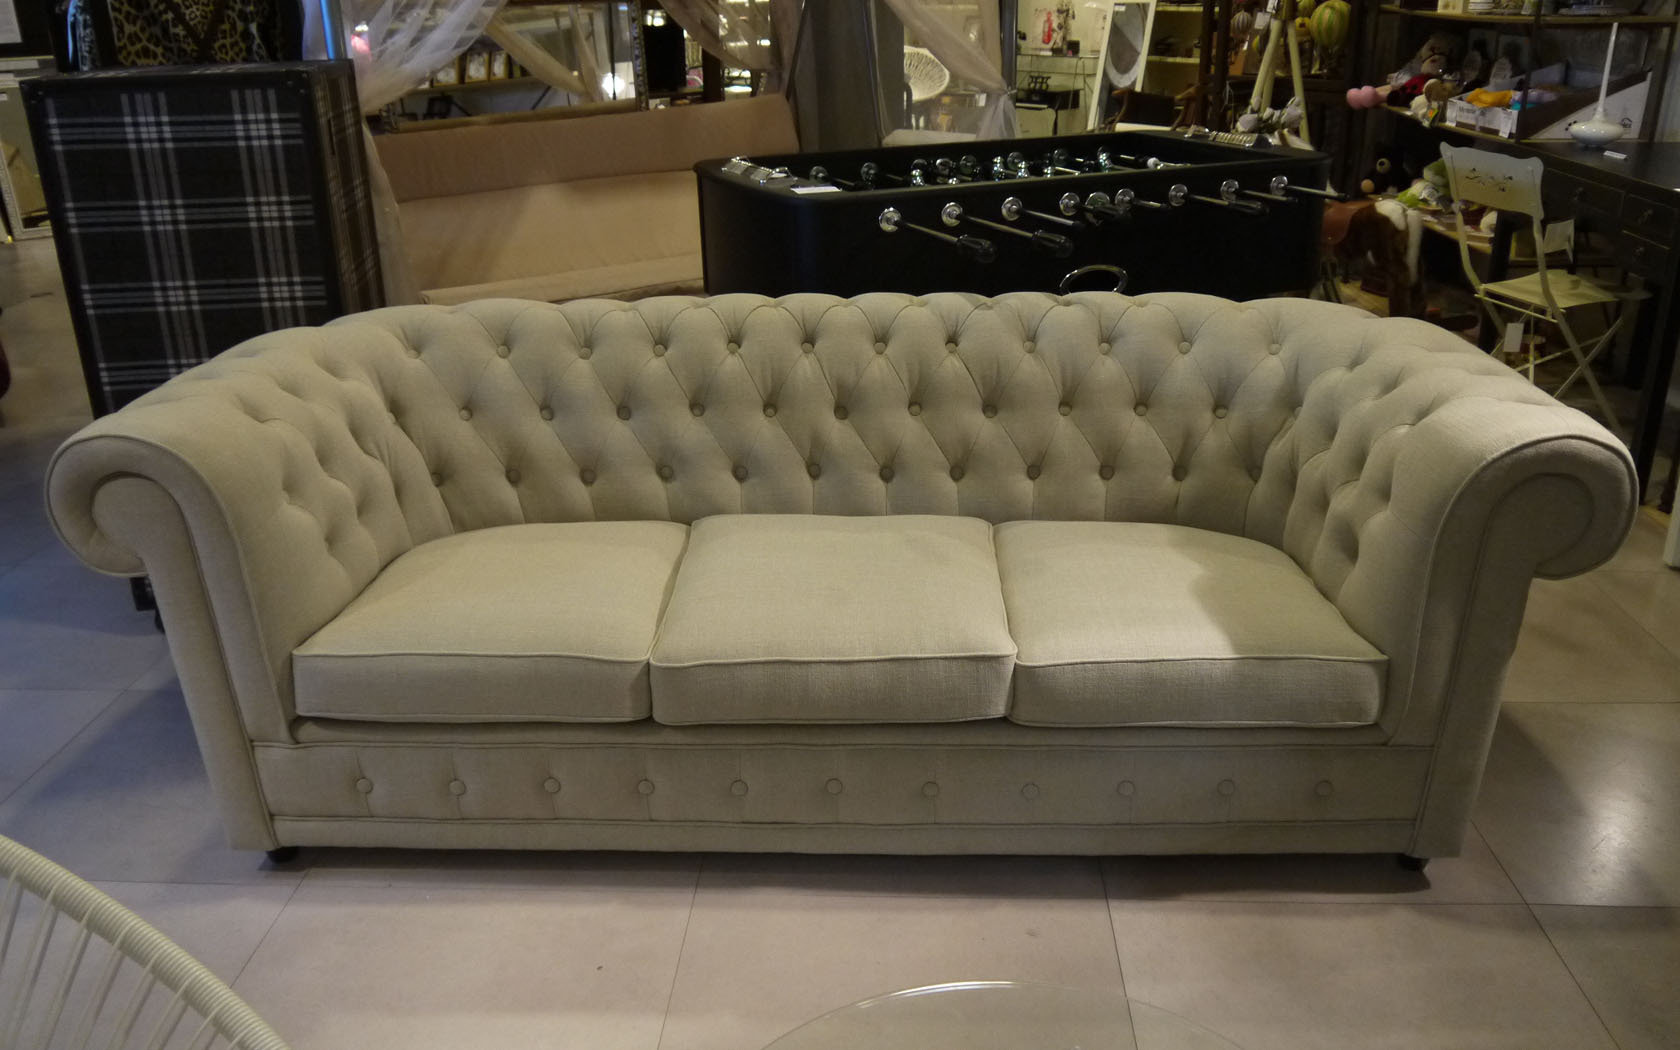 Sof chester estilo cl sico ingl s diferentes tapicerias for Sofa clasico ingles